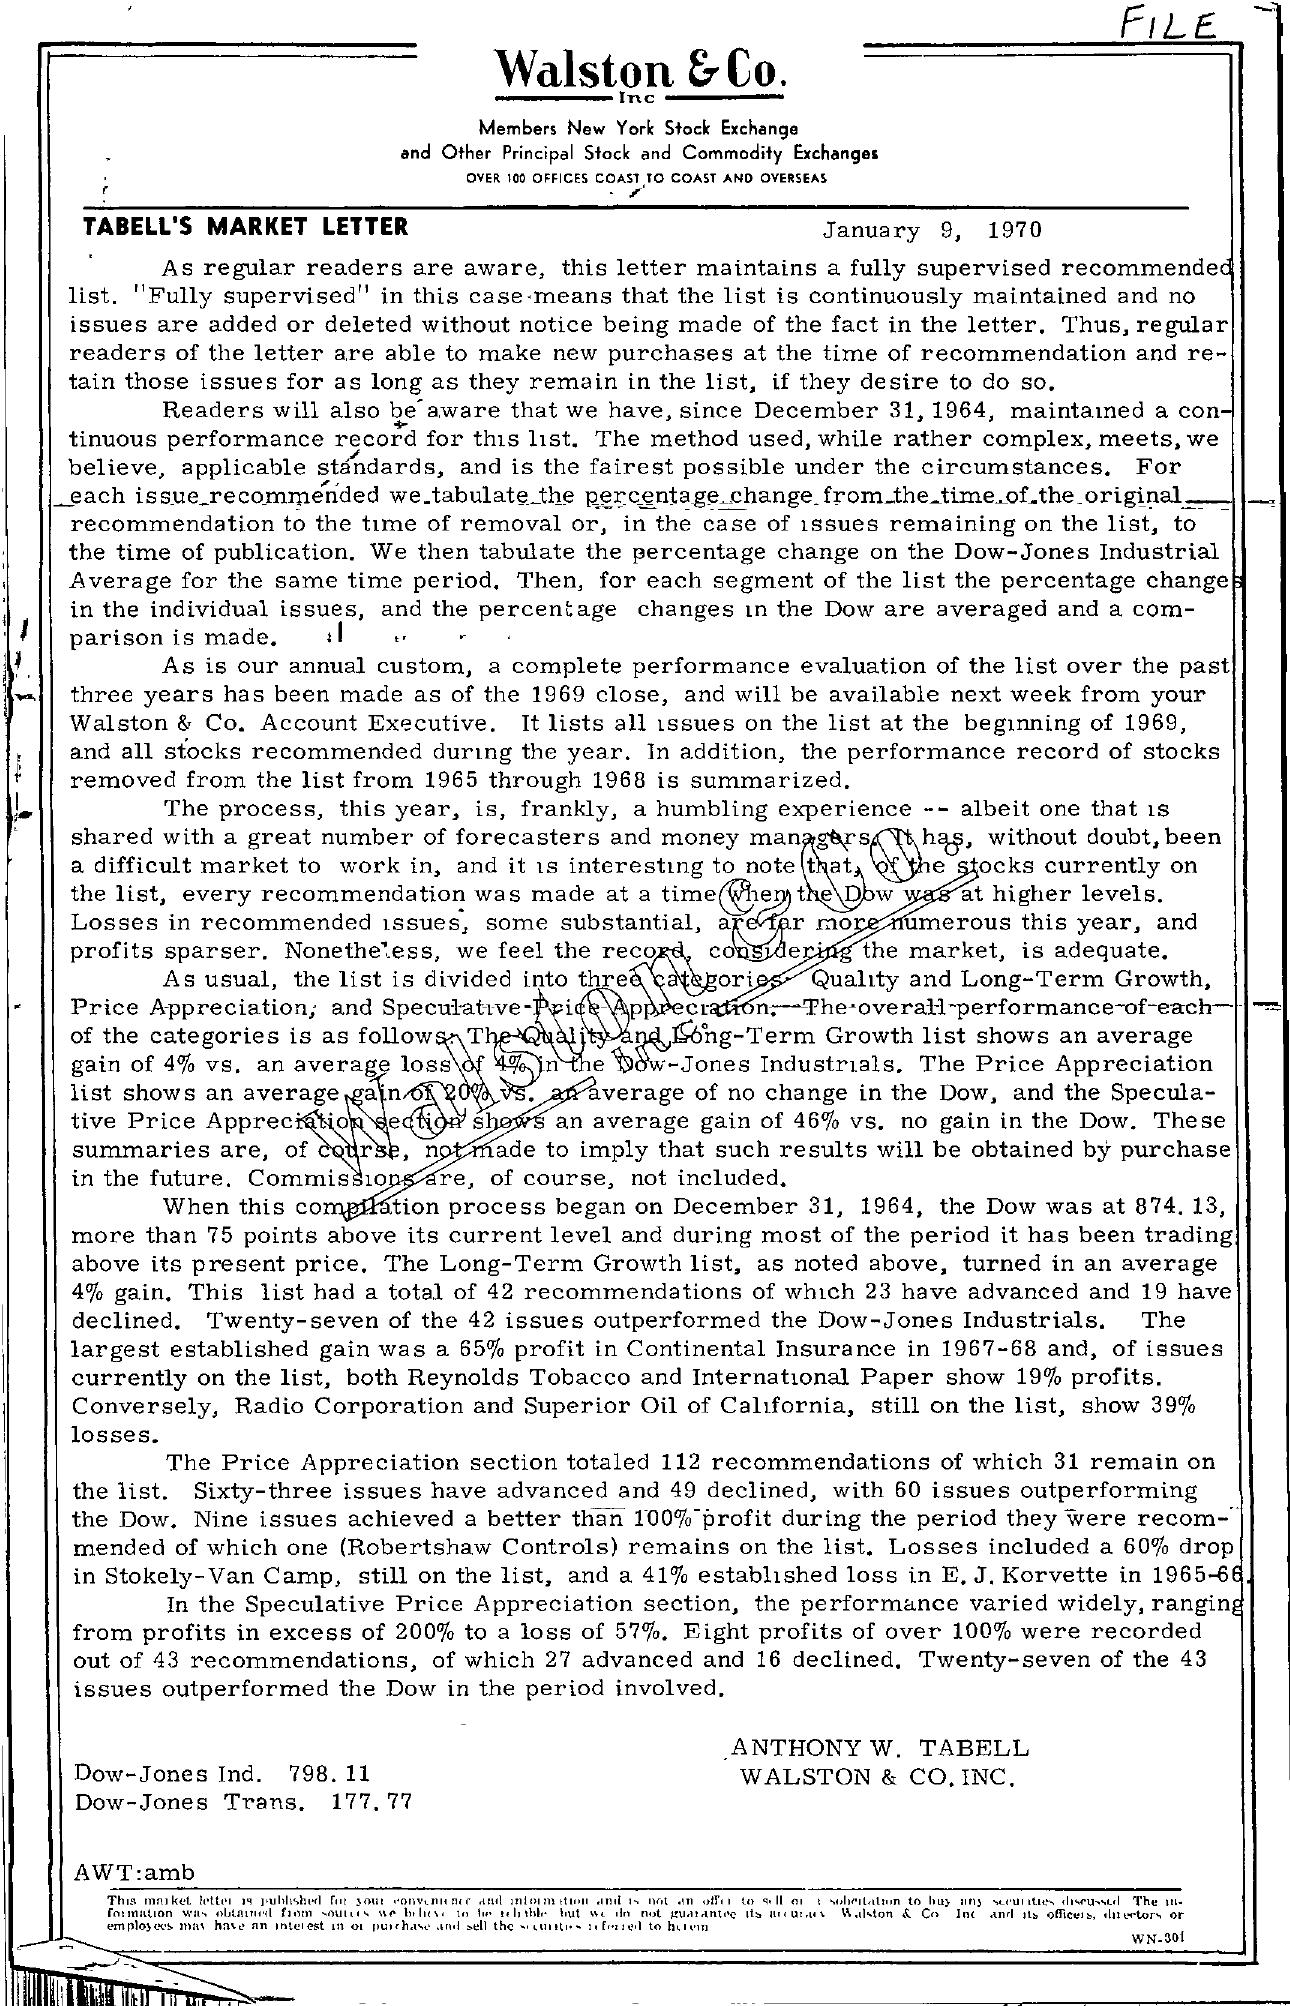 Tabell's Market Letter - January 09, 1970